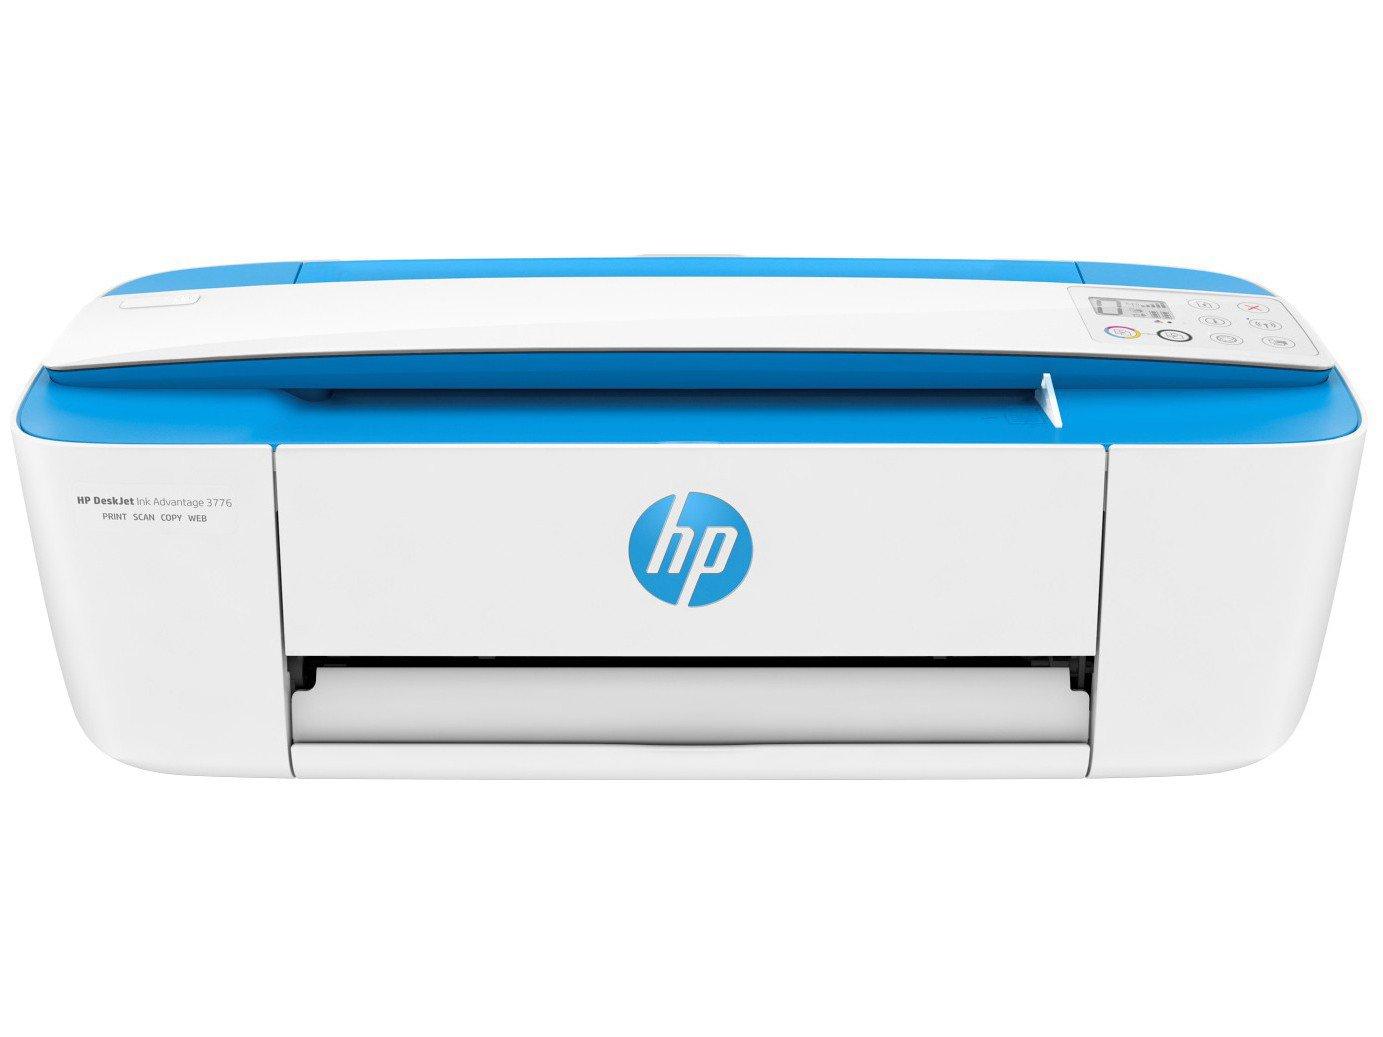 Foto 10 - Impressora Multifuncional HP - DeskJet Ink Advantage 3776 Jato de Tinta Wi-Fi